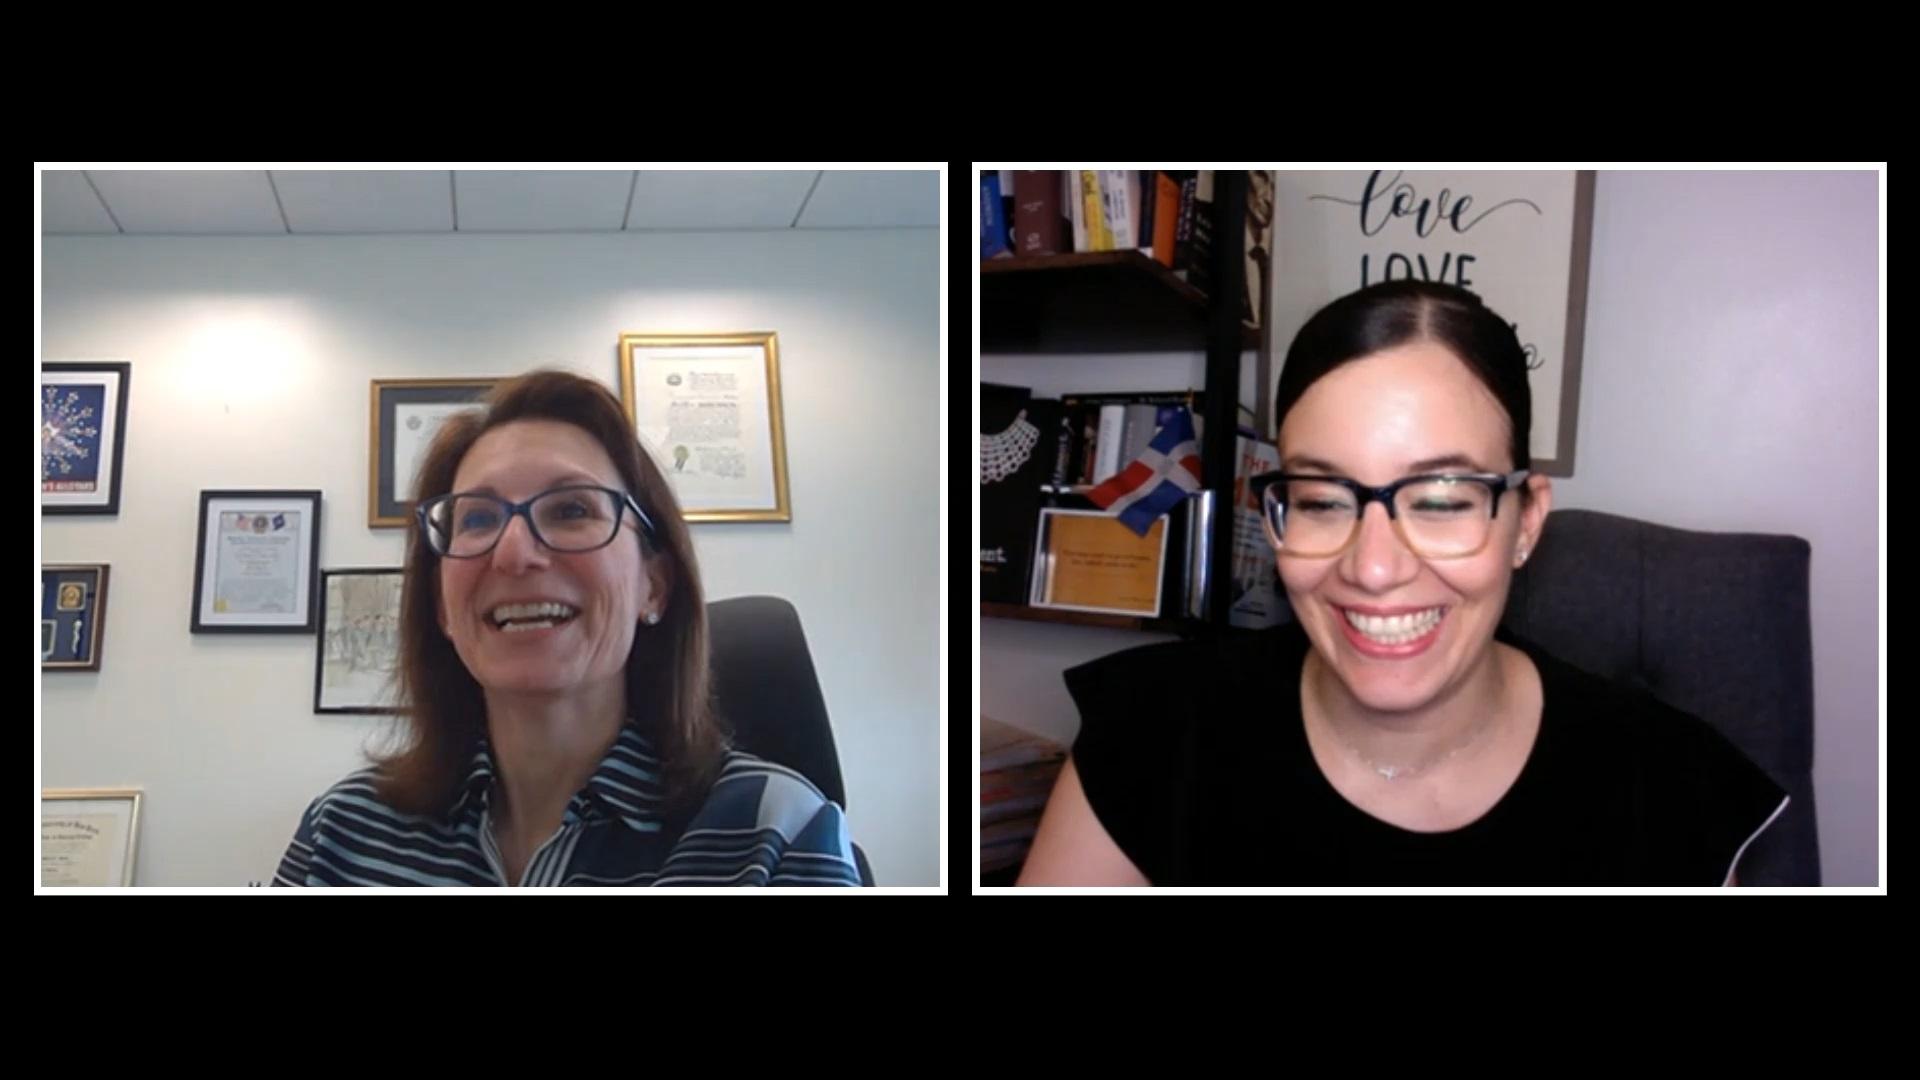 Interview with Hon. Donna-Marie E. Golia & Miguelina Camilo